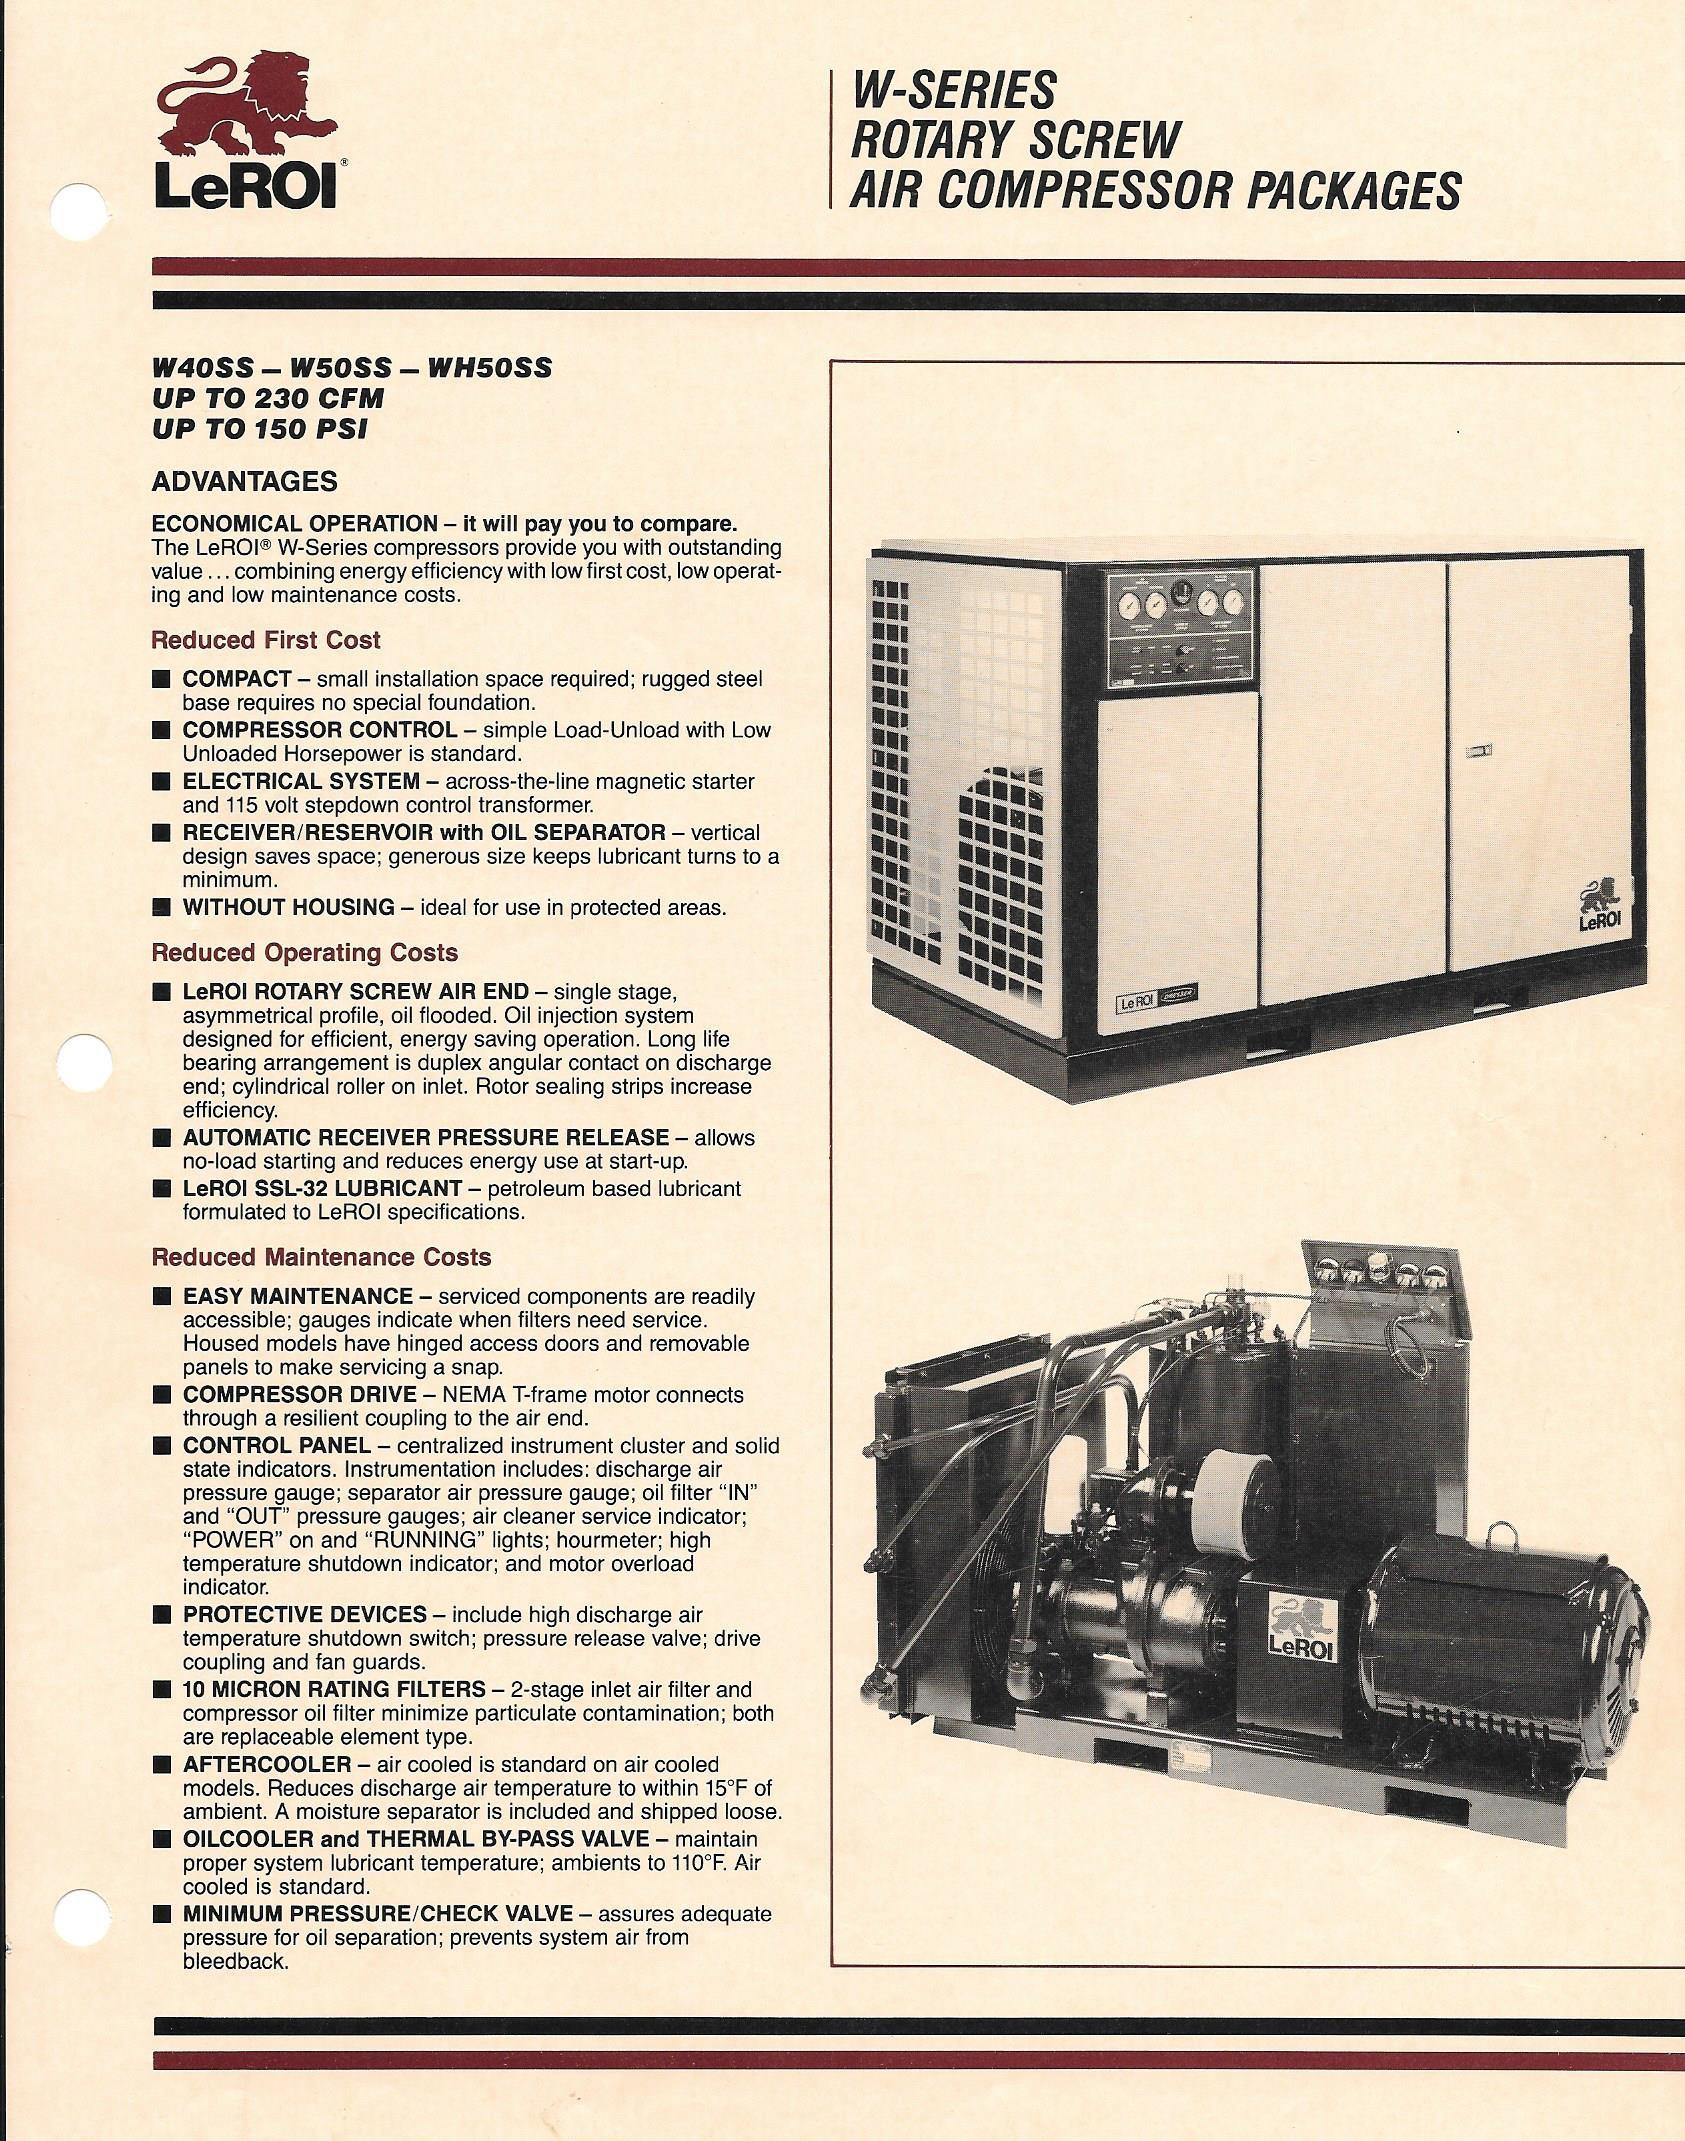 LeRoi Model W50SS 50 HP Rotary Screw Air Compressor, S/N 4166X10, New 1986.